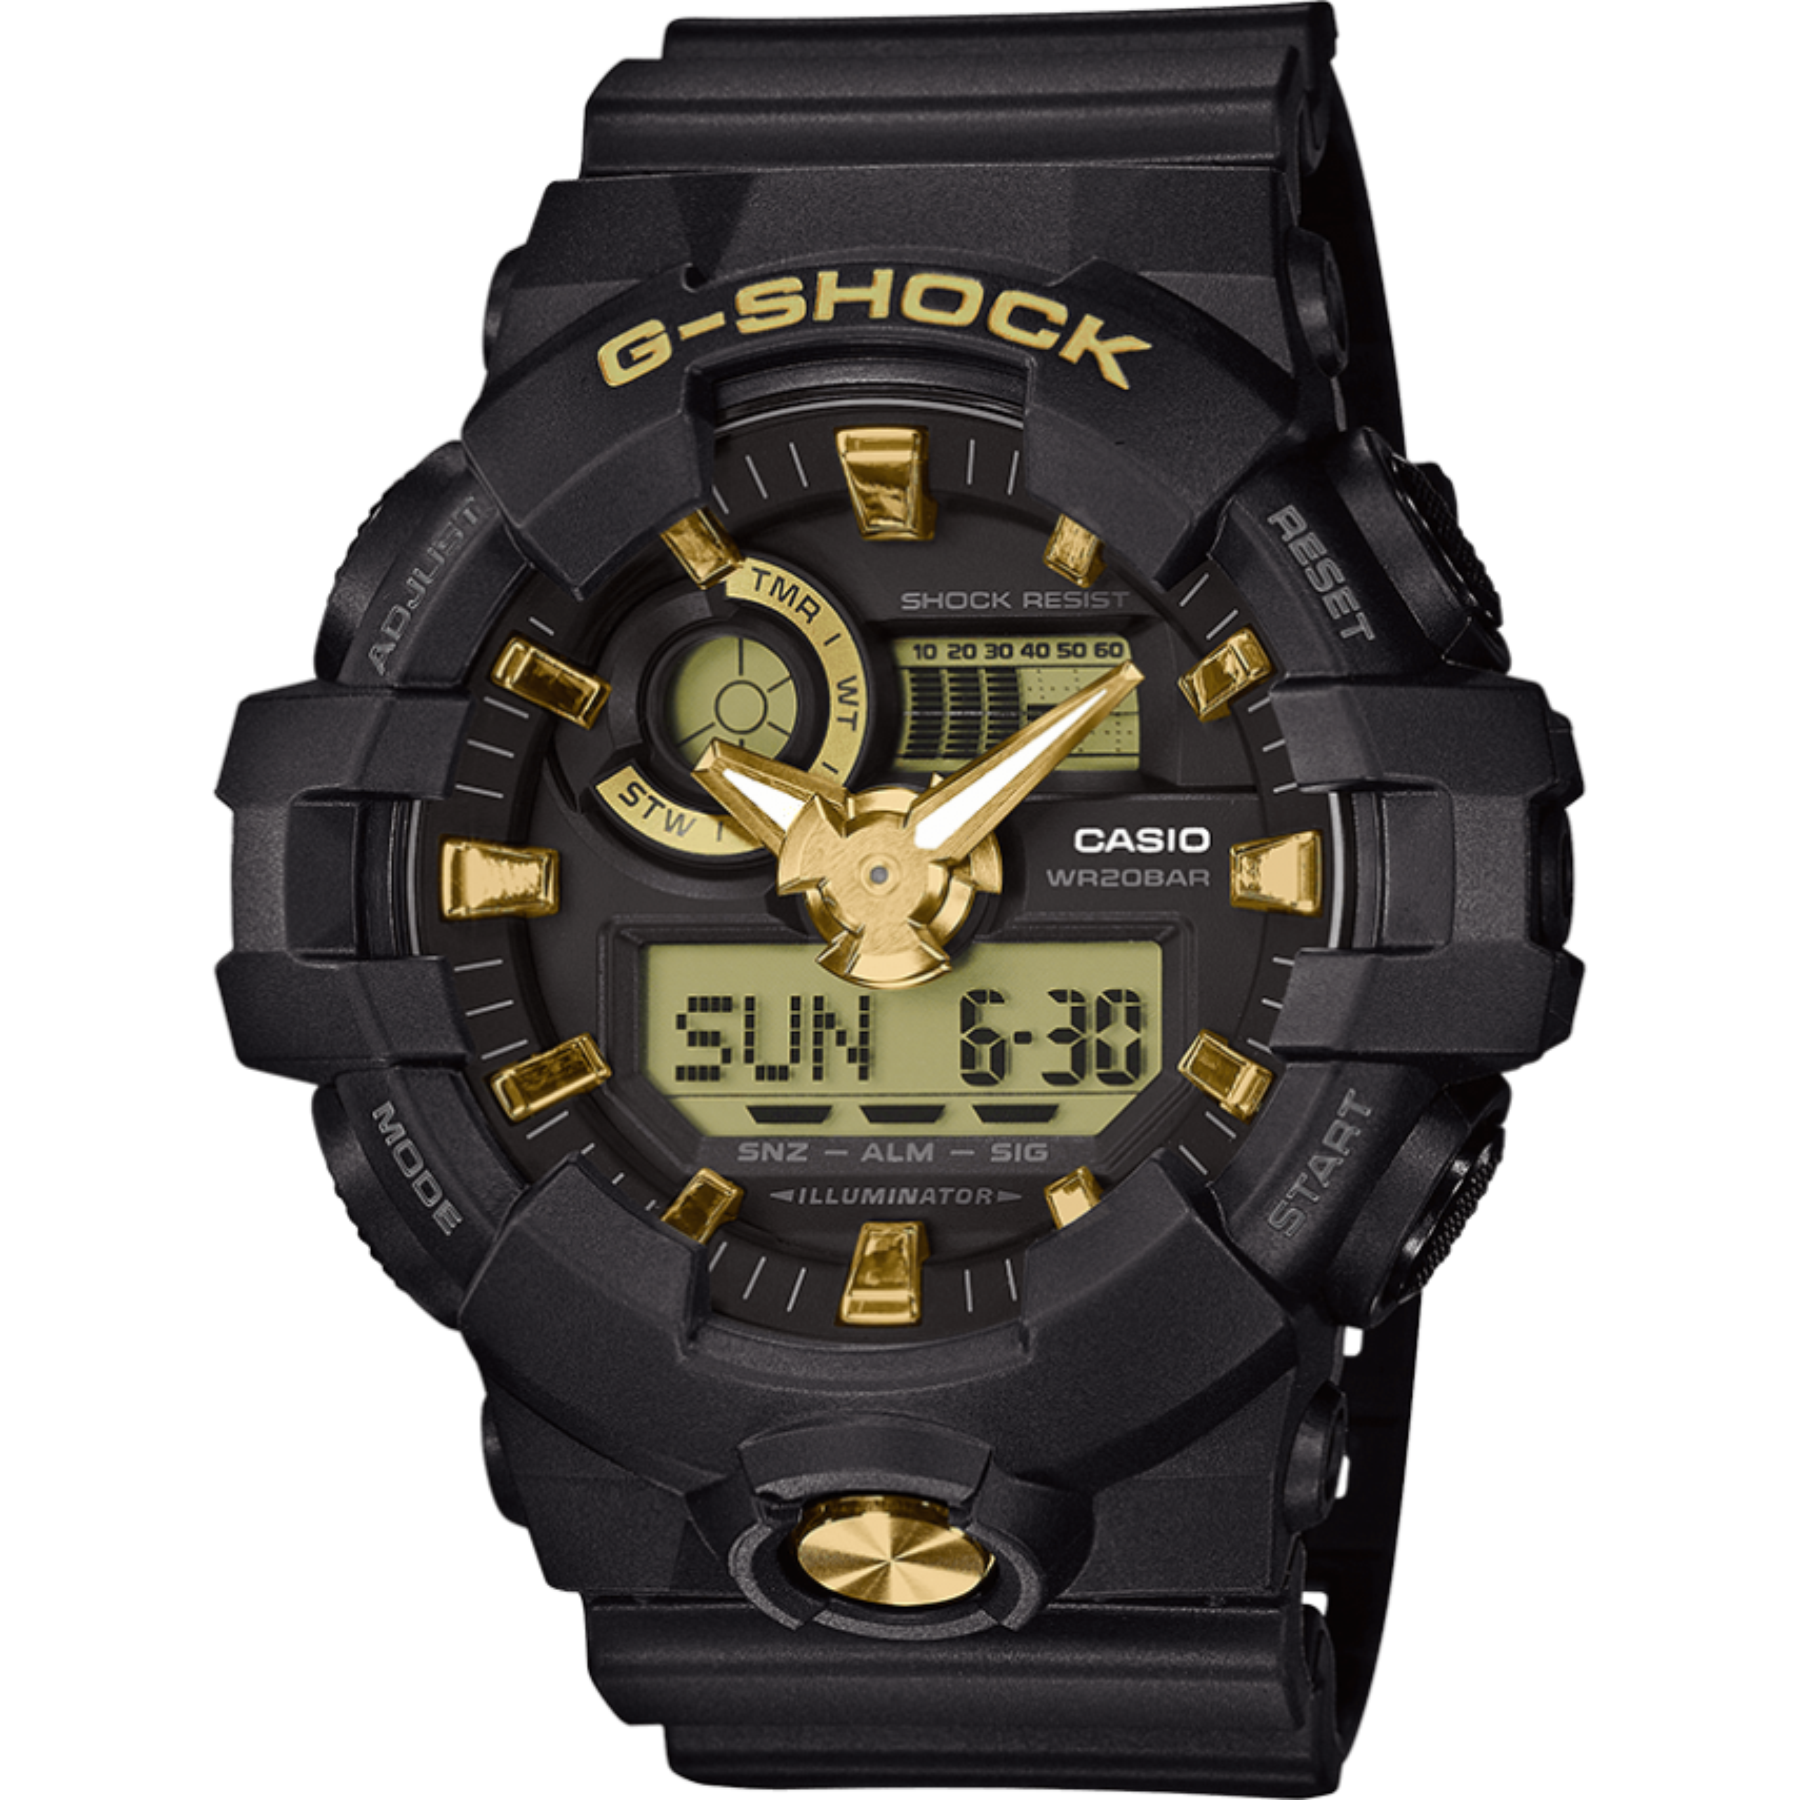 OROLOGIO G-SHOCK GA-710B-1A9ER